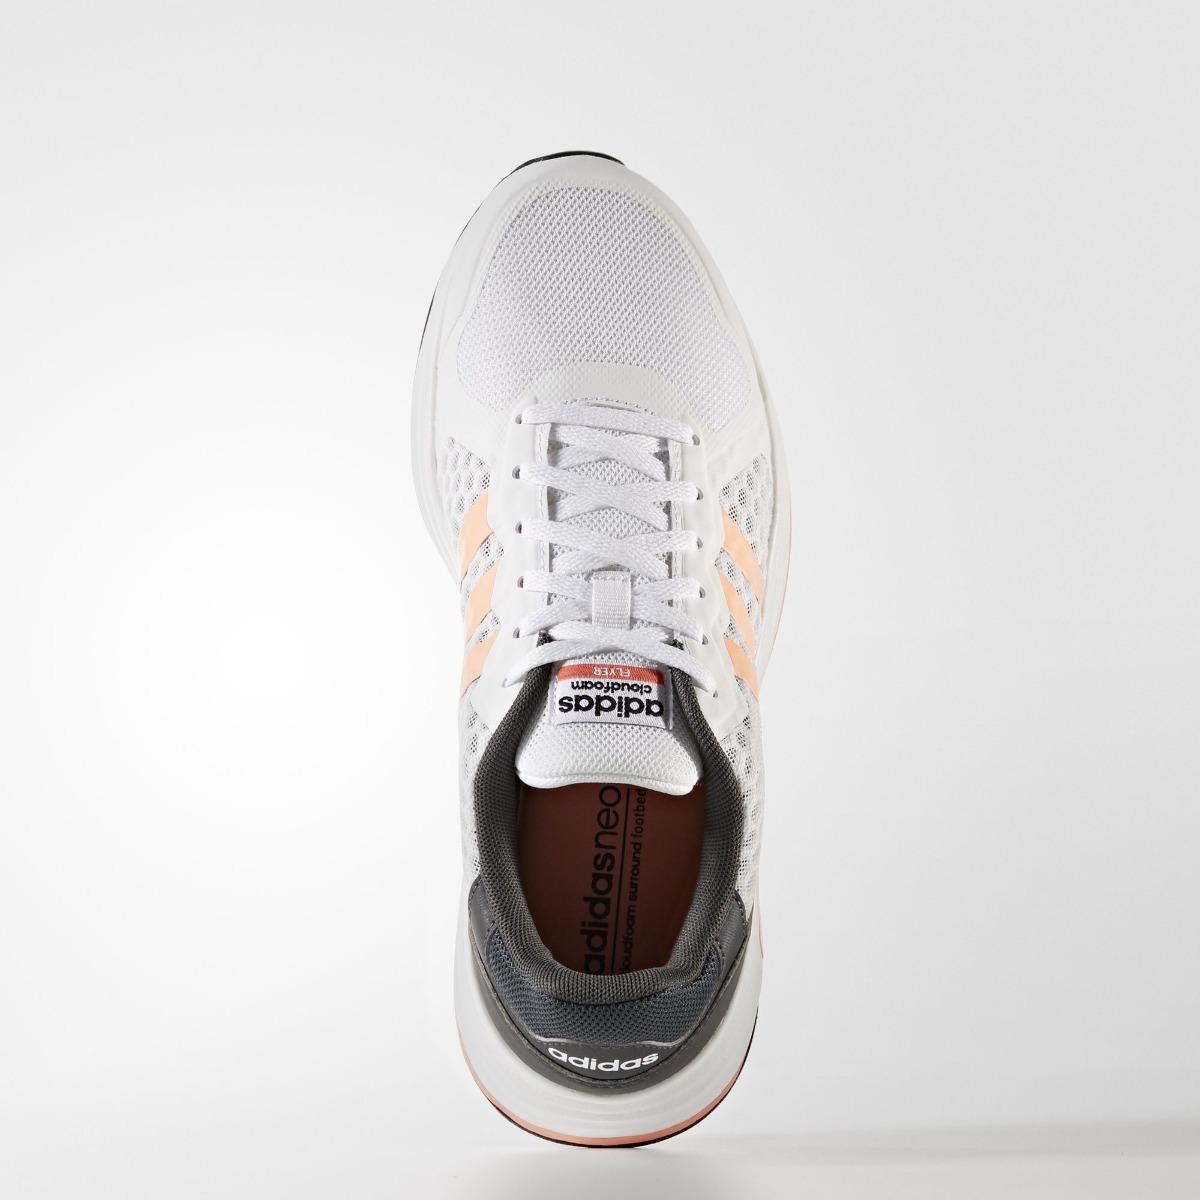 sale retailer 090b2 6f416 tenis para dama adidas cloudfoam flyer w 4726. Cargando zoom.